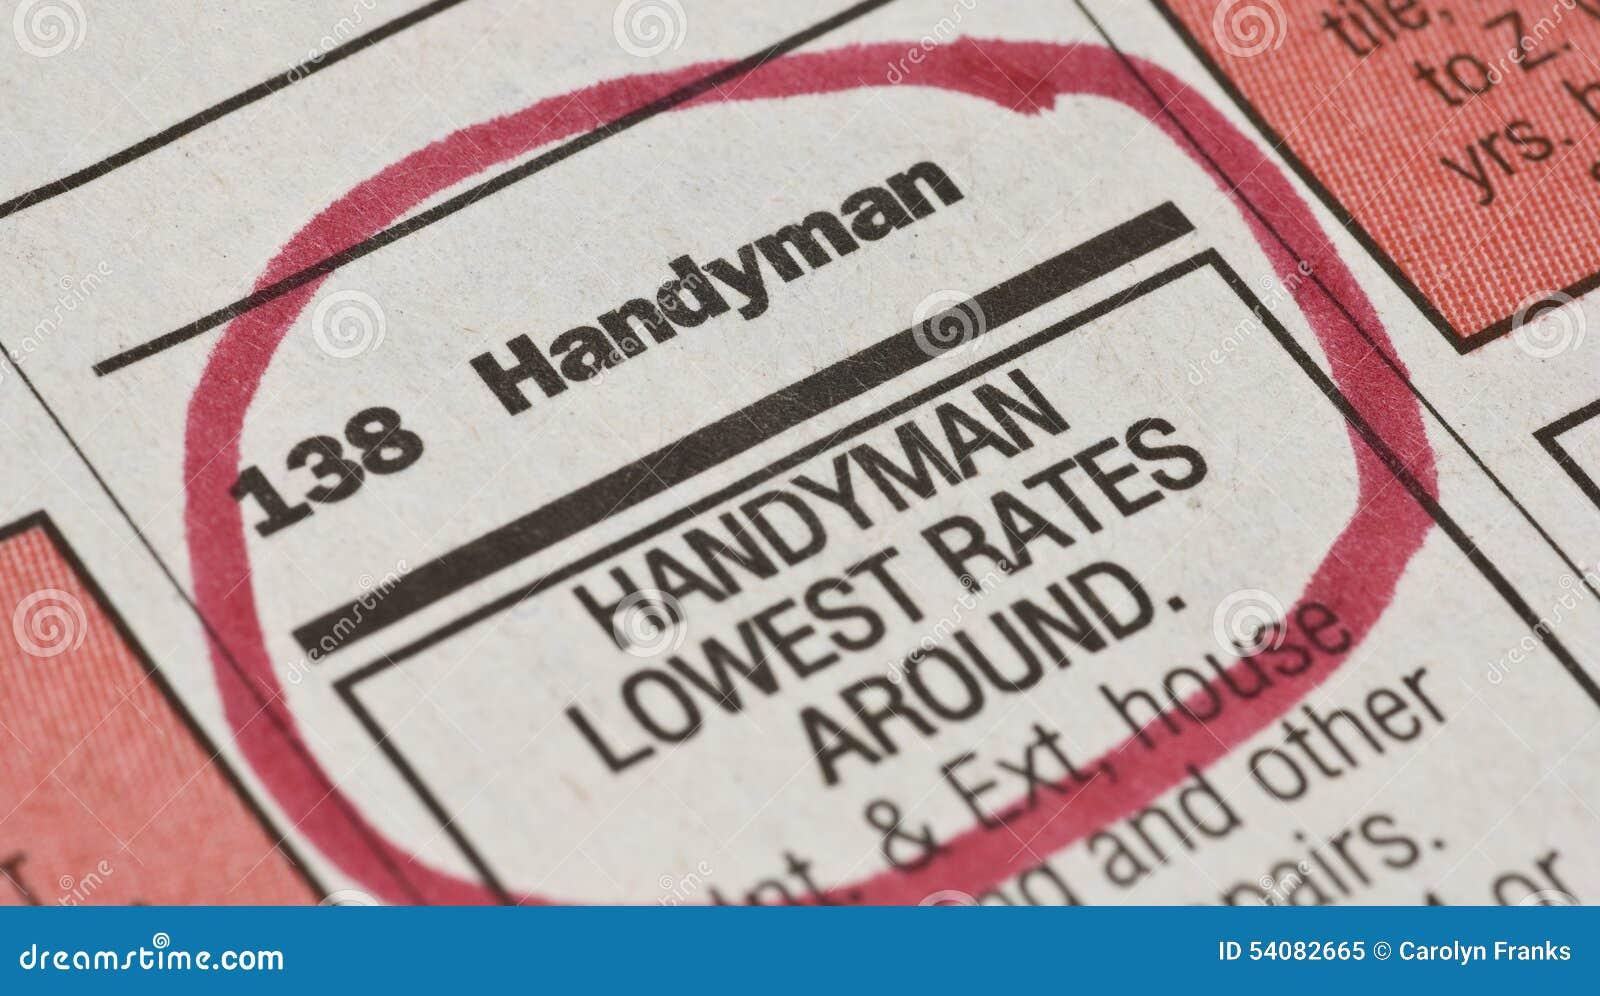 Handyman Ad Stock Photo - Image: 54082665